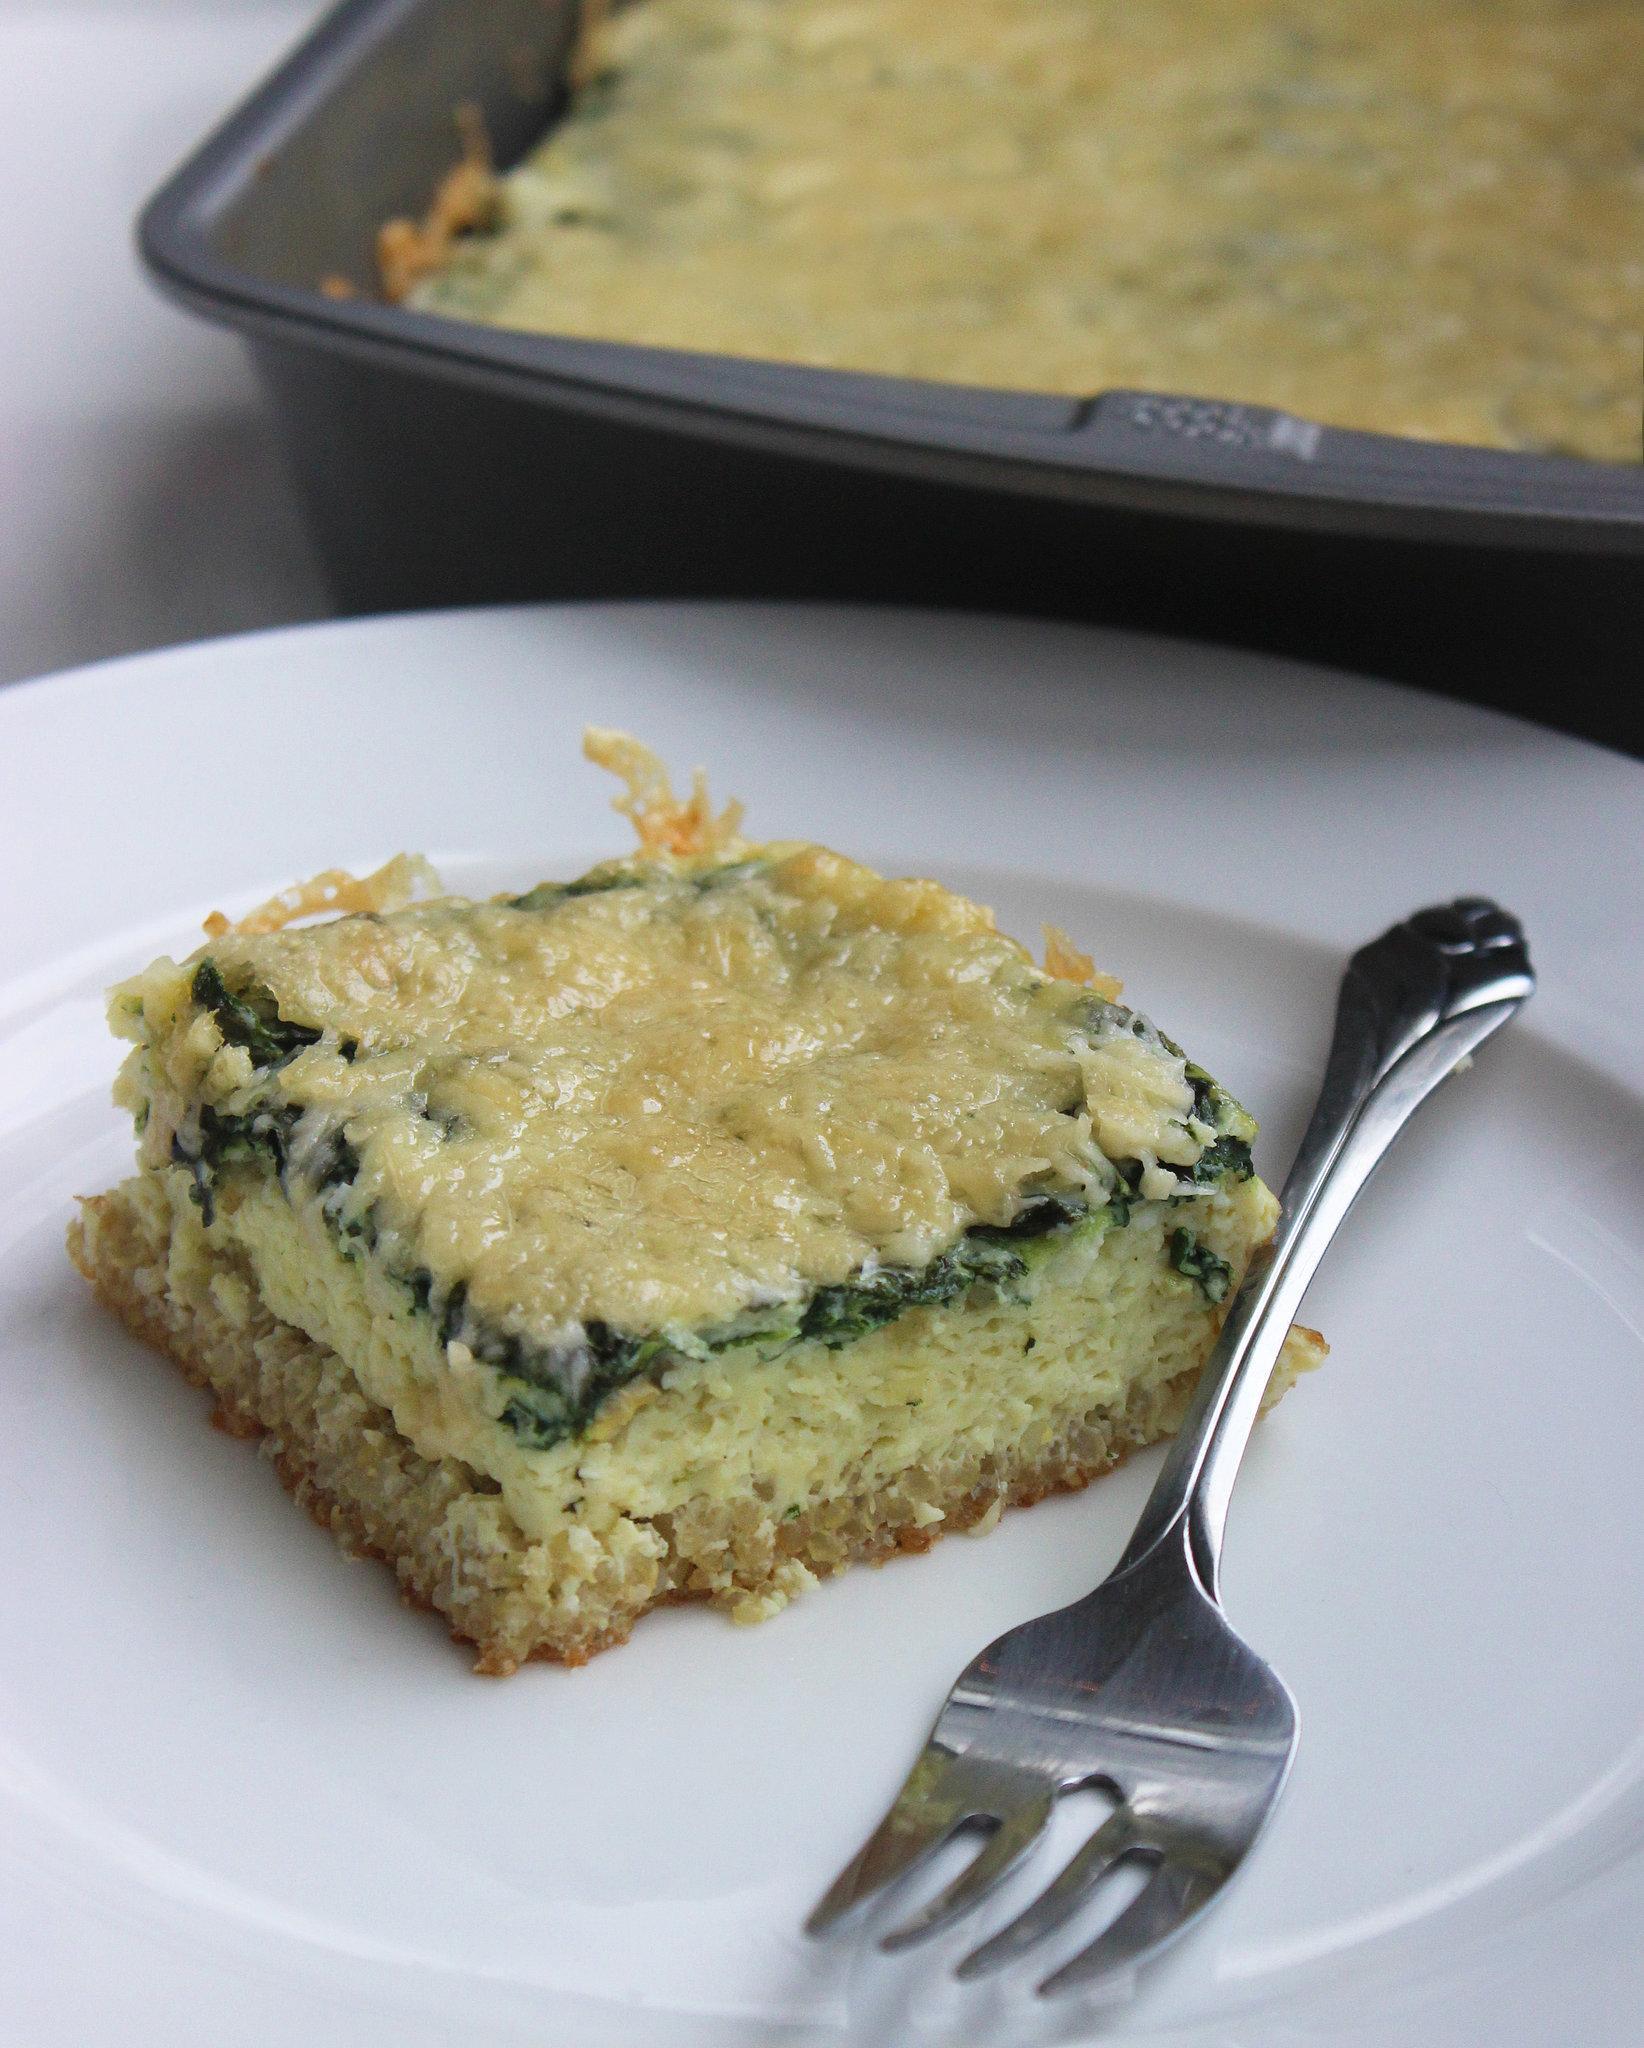 ... recipe combines two superproteins quinoa and eggs the quinoa serves as